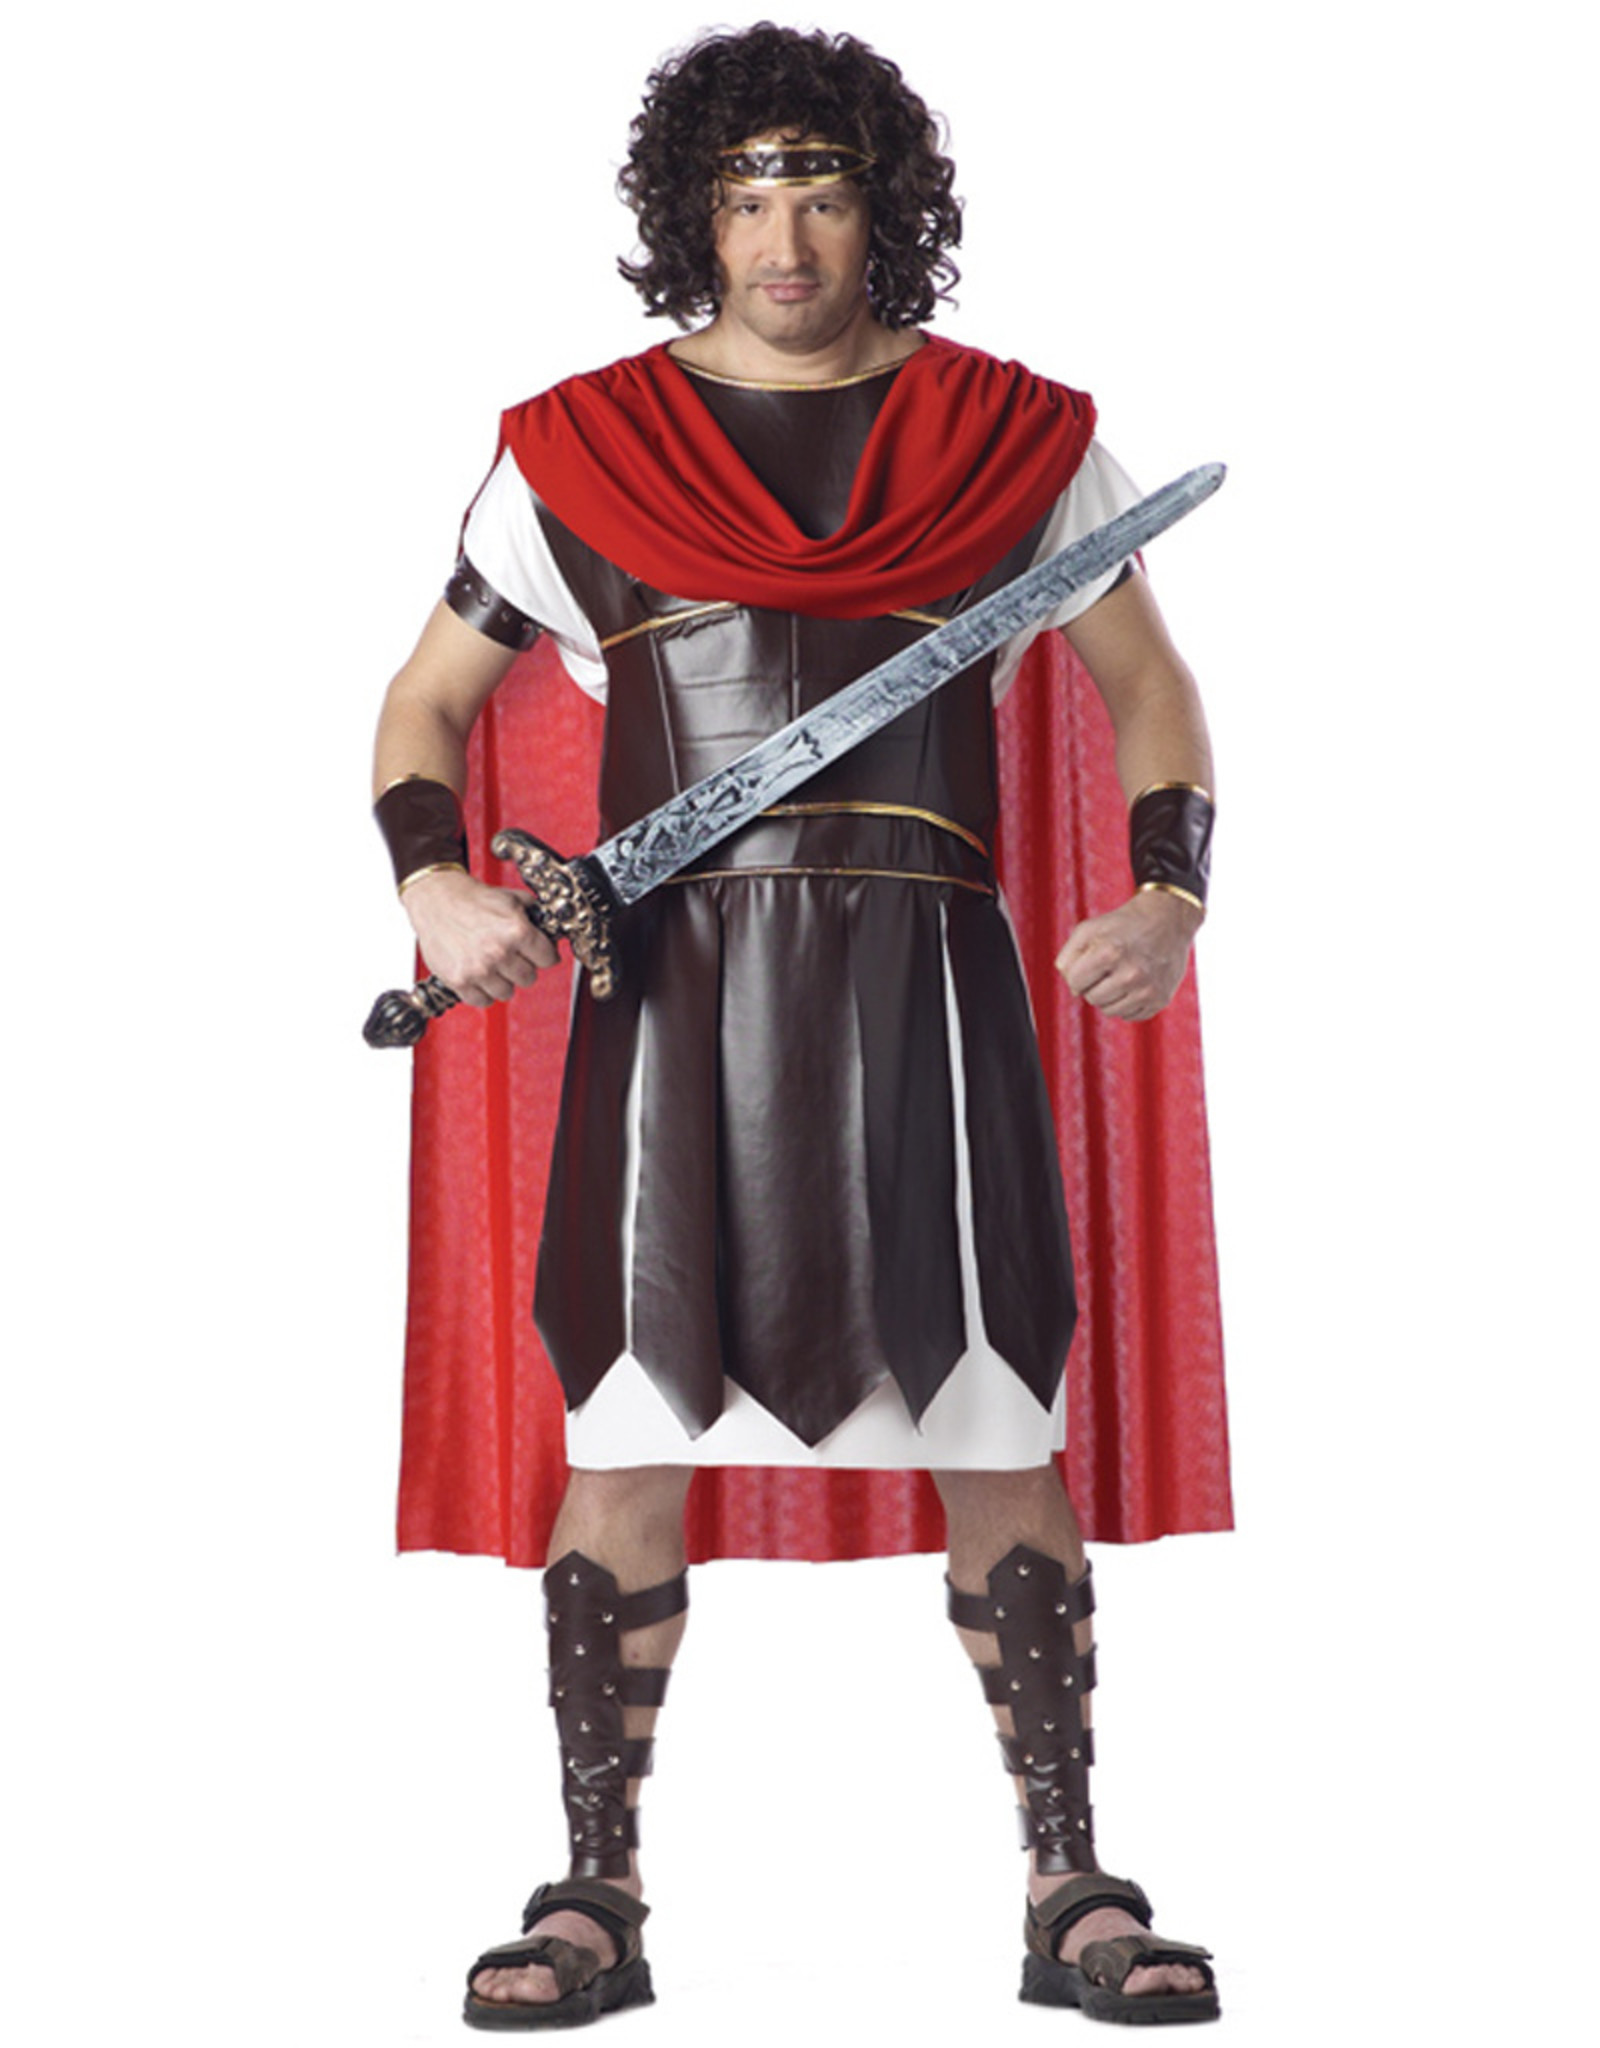 Hercules Costume - Men's Plus